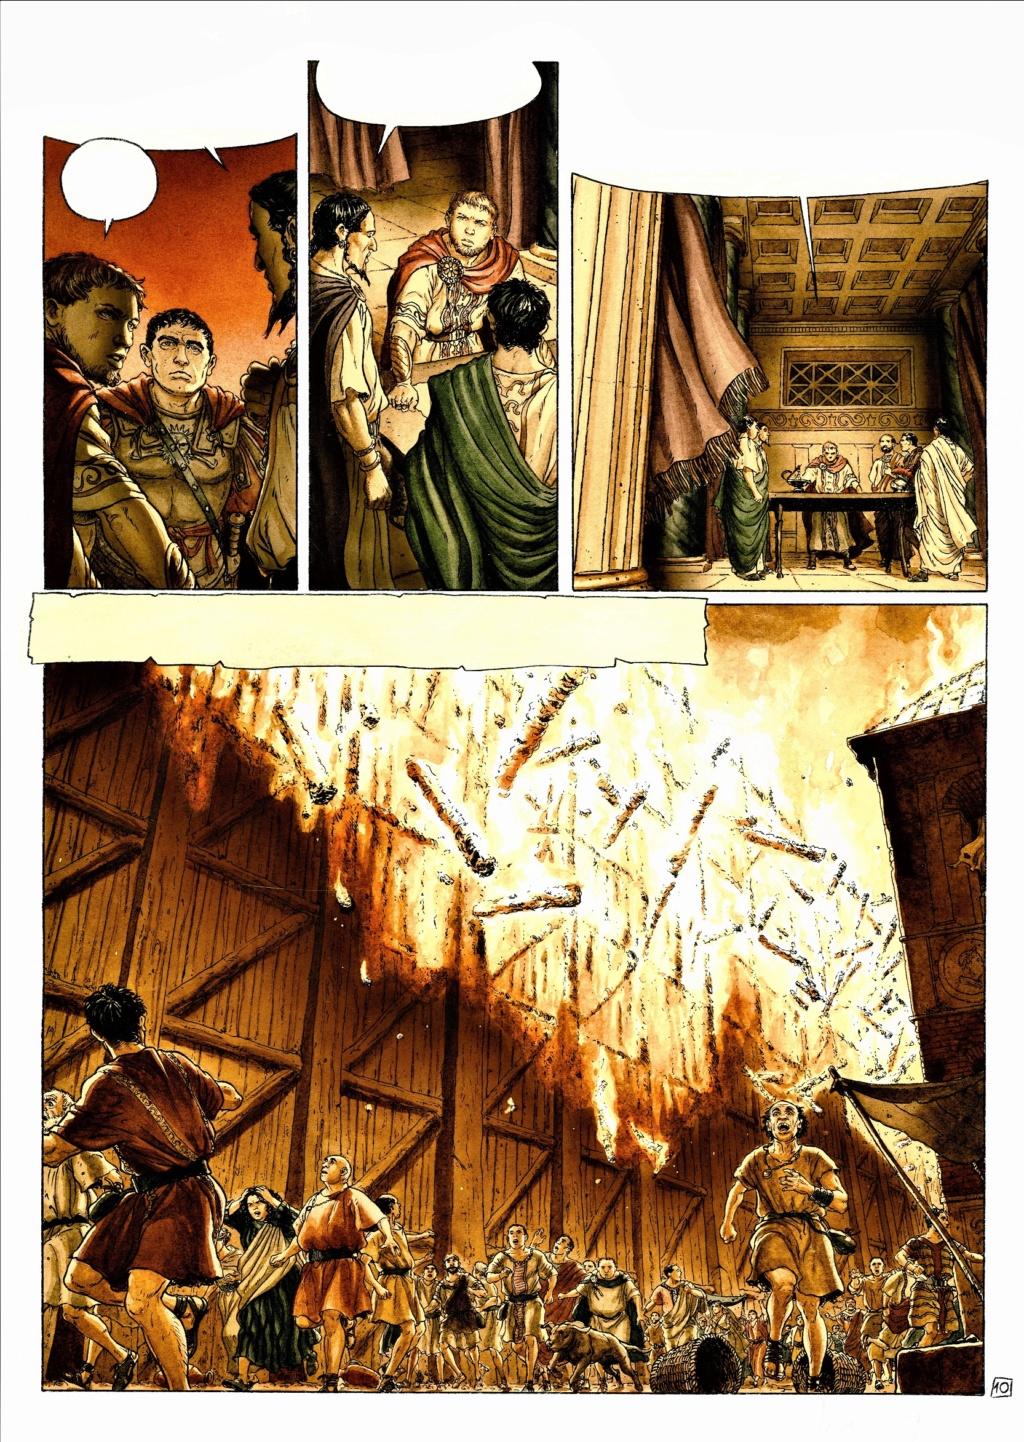 Murena a t-il remplacé Alix ? - Page 5 Delaby15